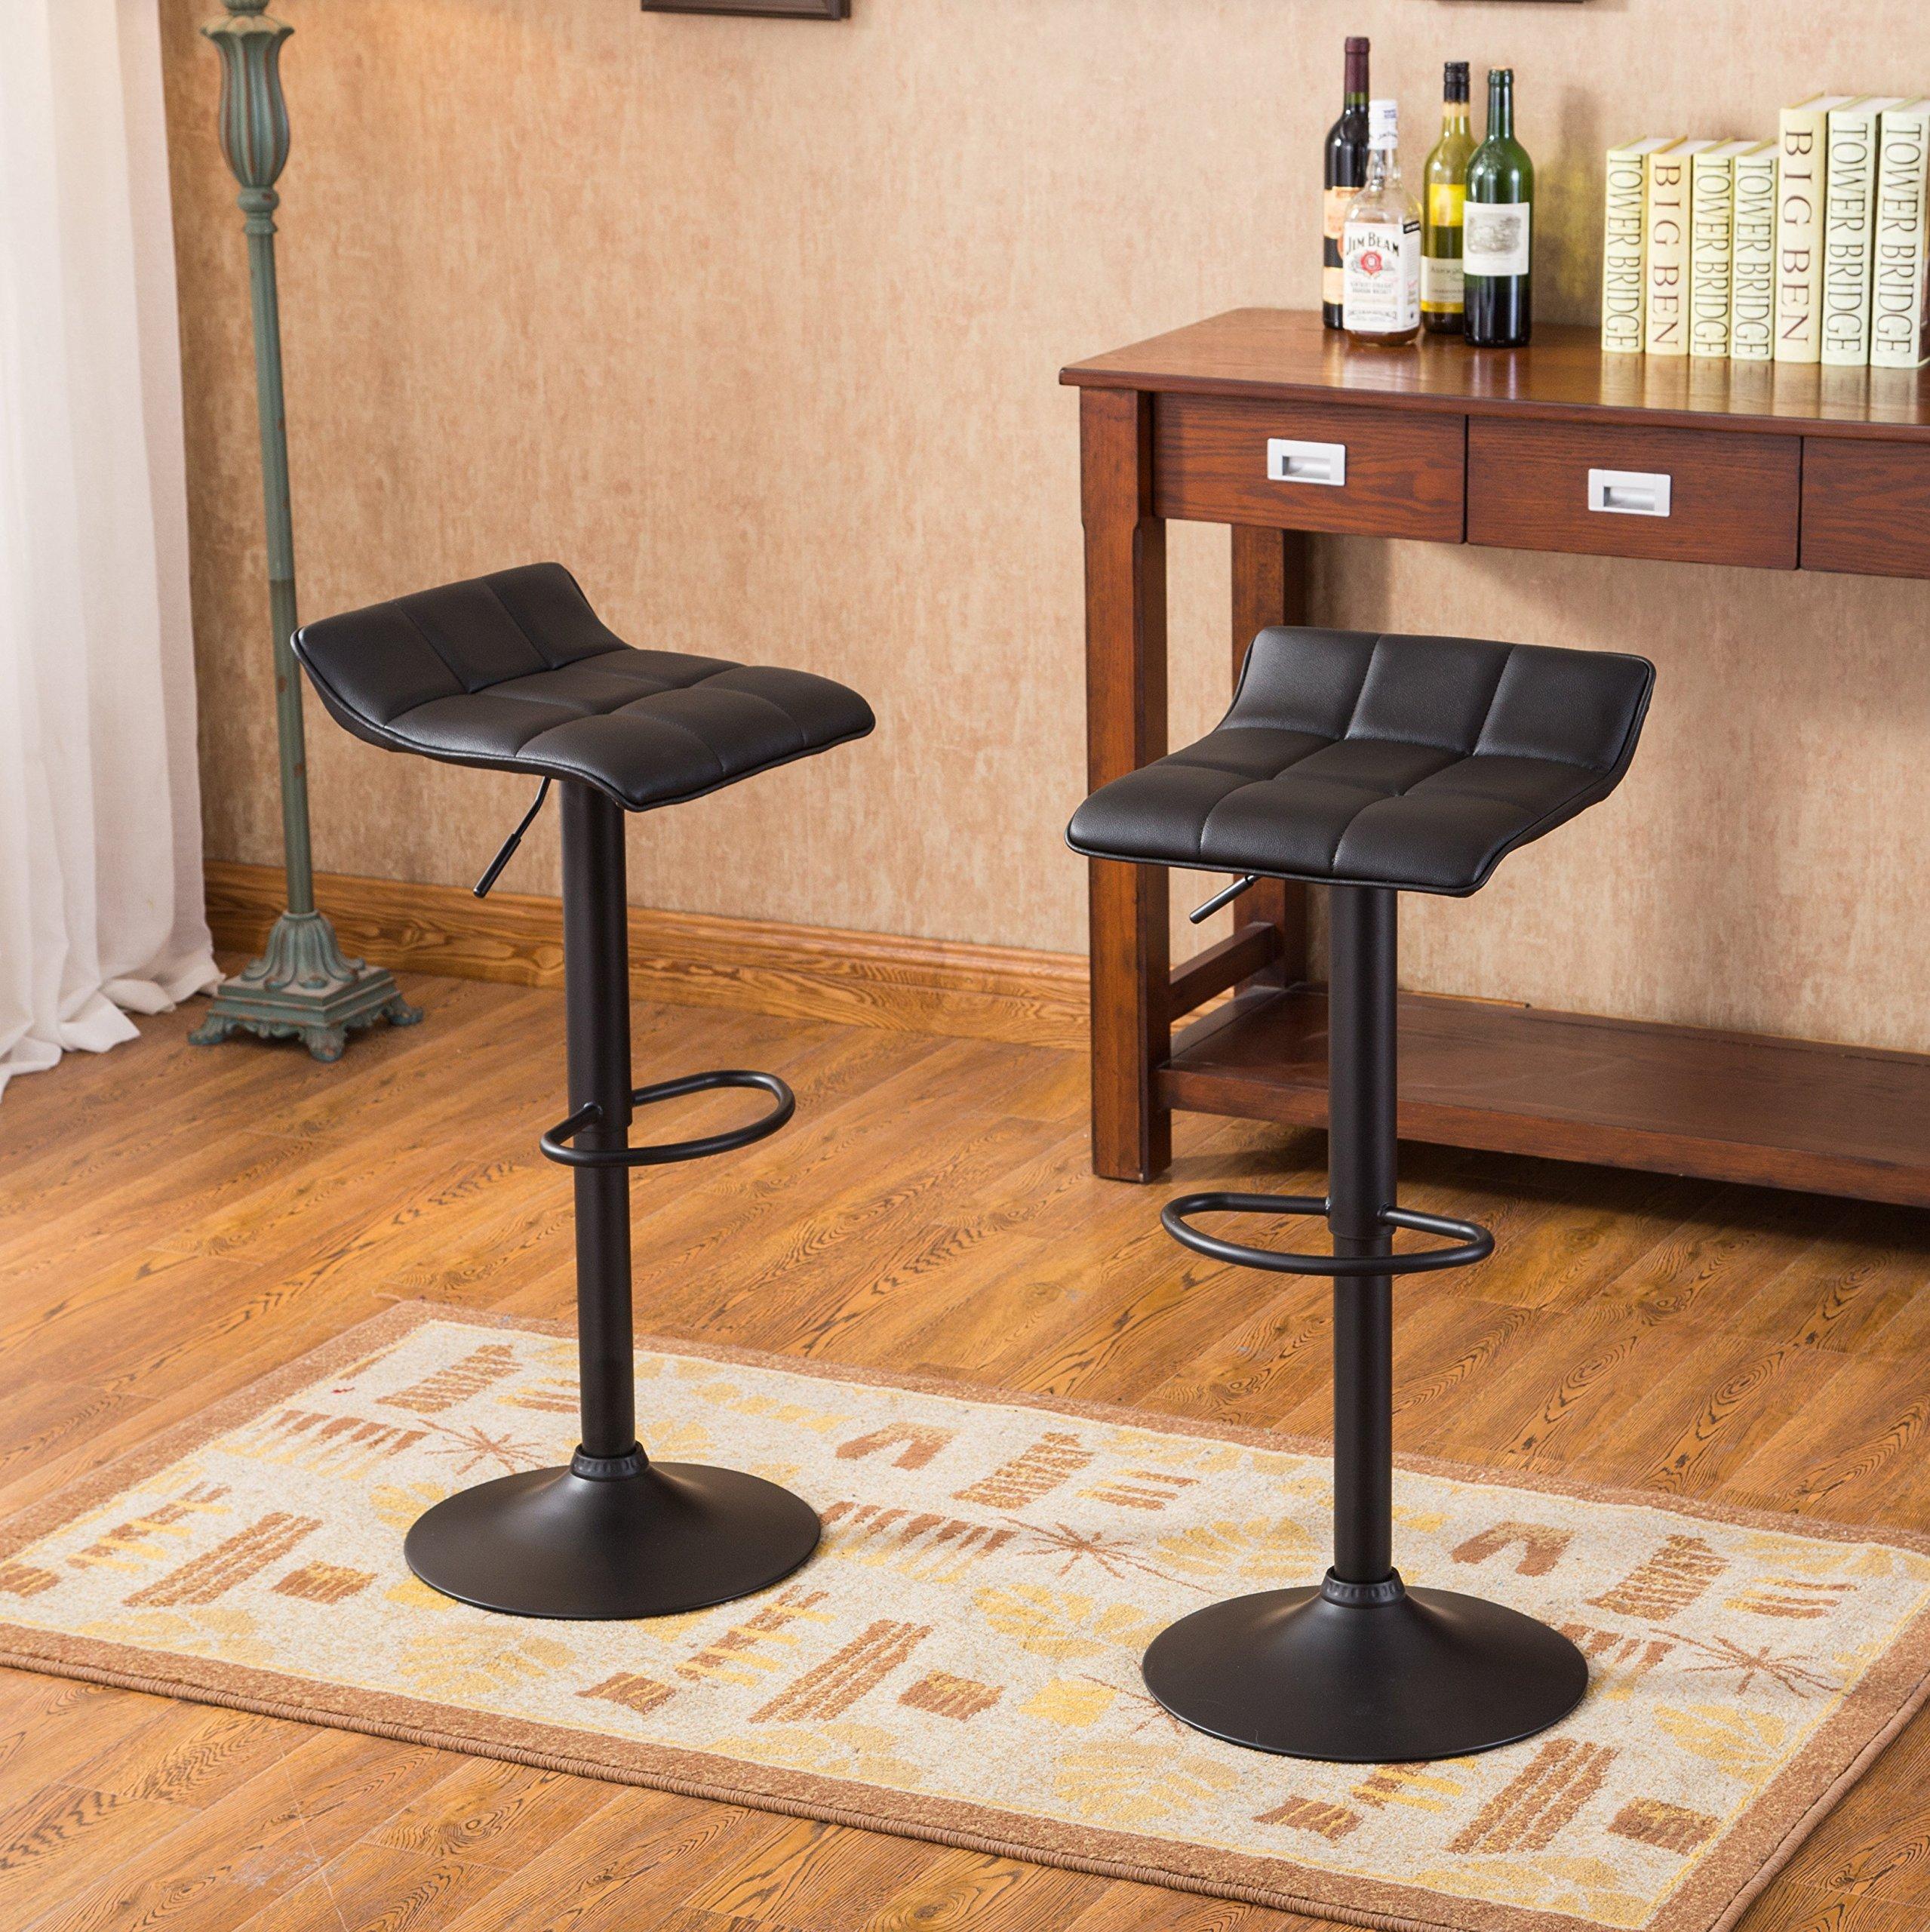 Surprising Details About Roundhill Furniture Belham Swivel Black Bonded Leather Adjustable Bar Stool Set Uwap Interior Chair Design Uwaporg